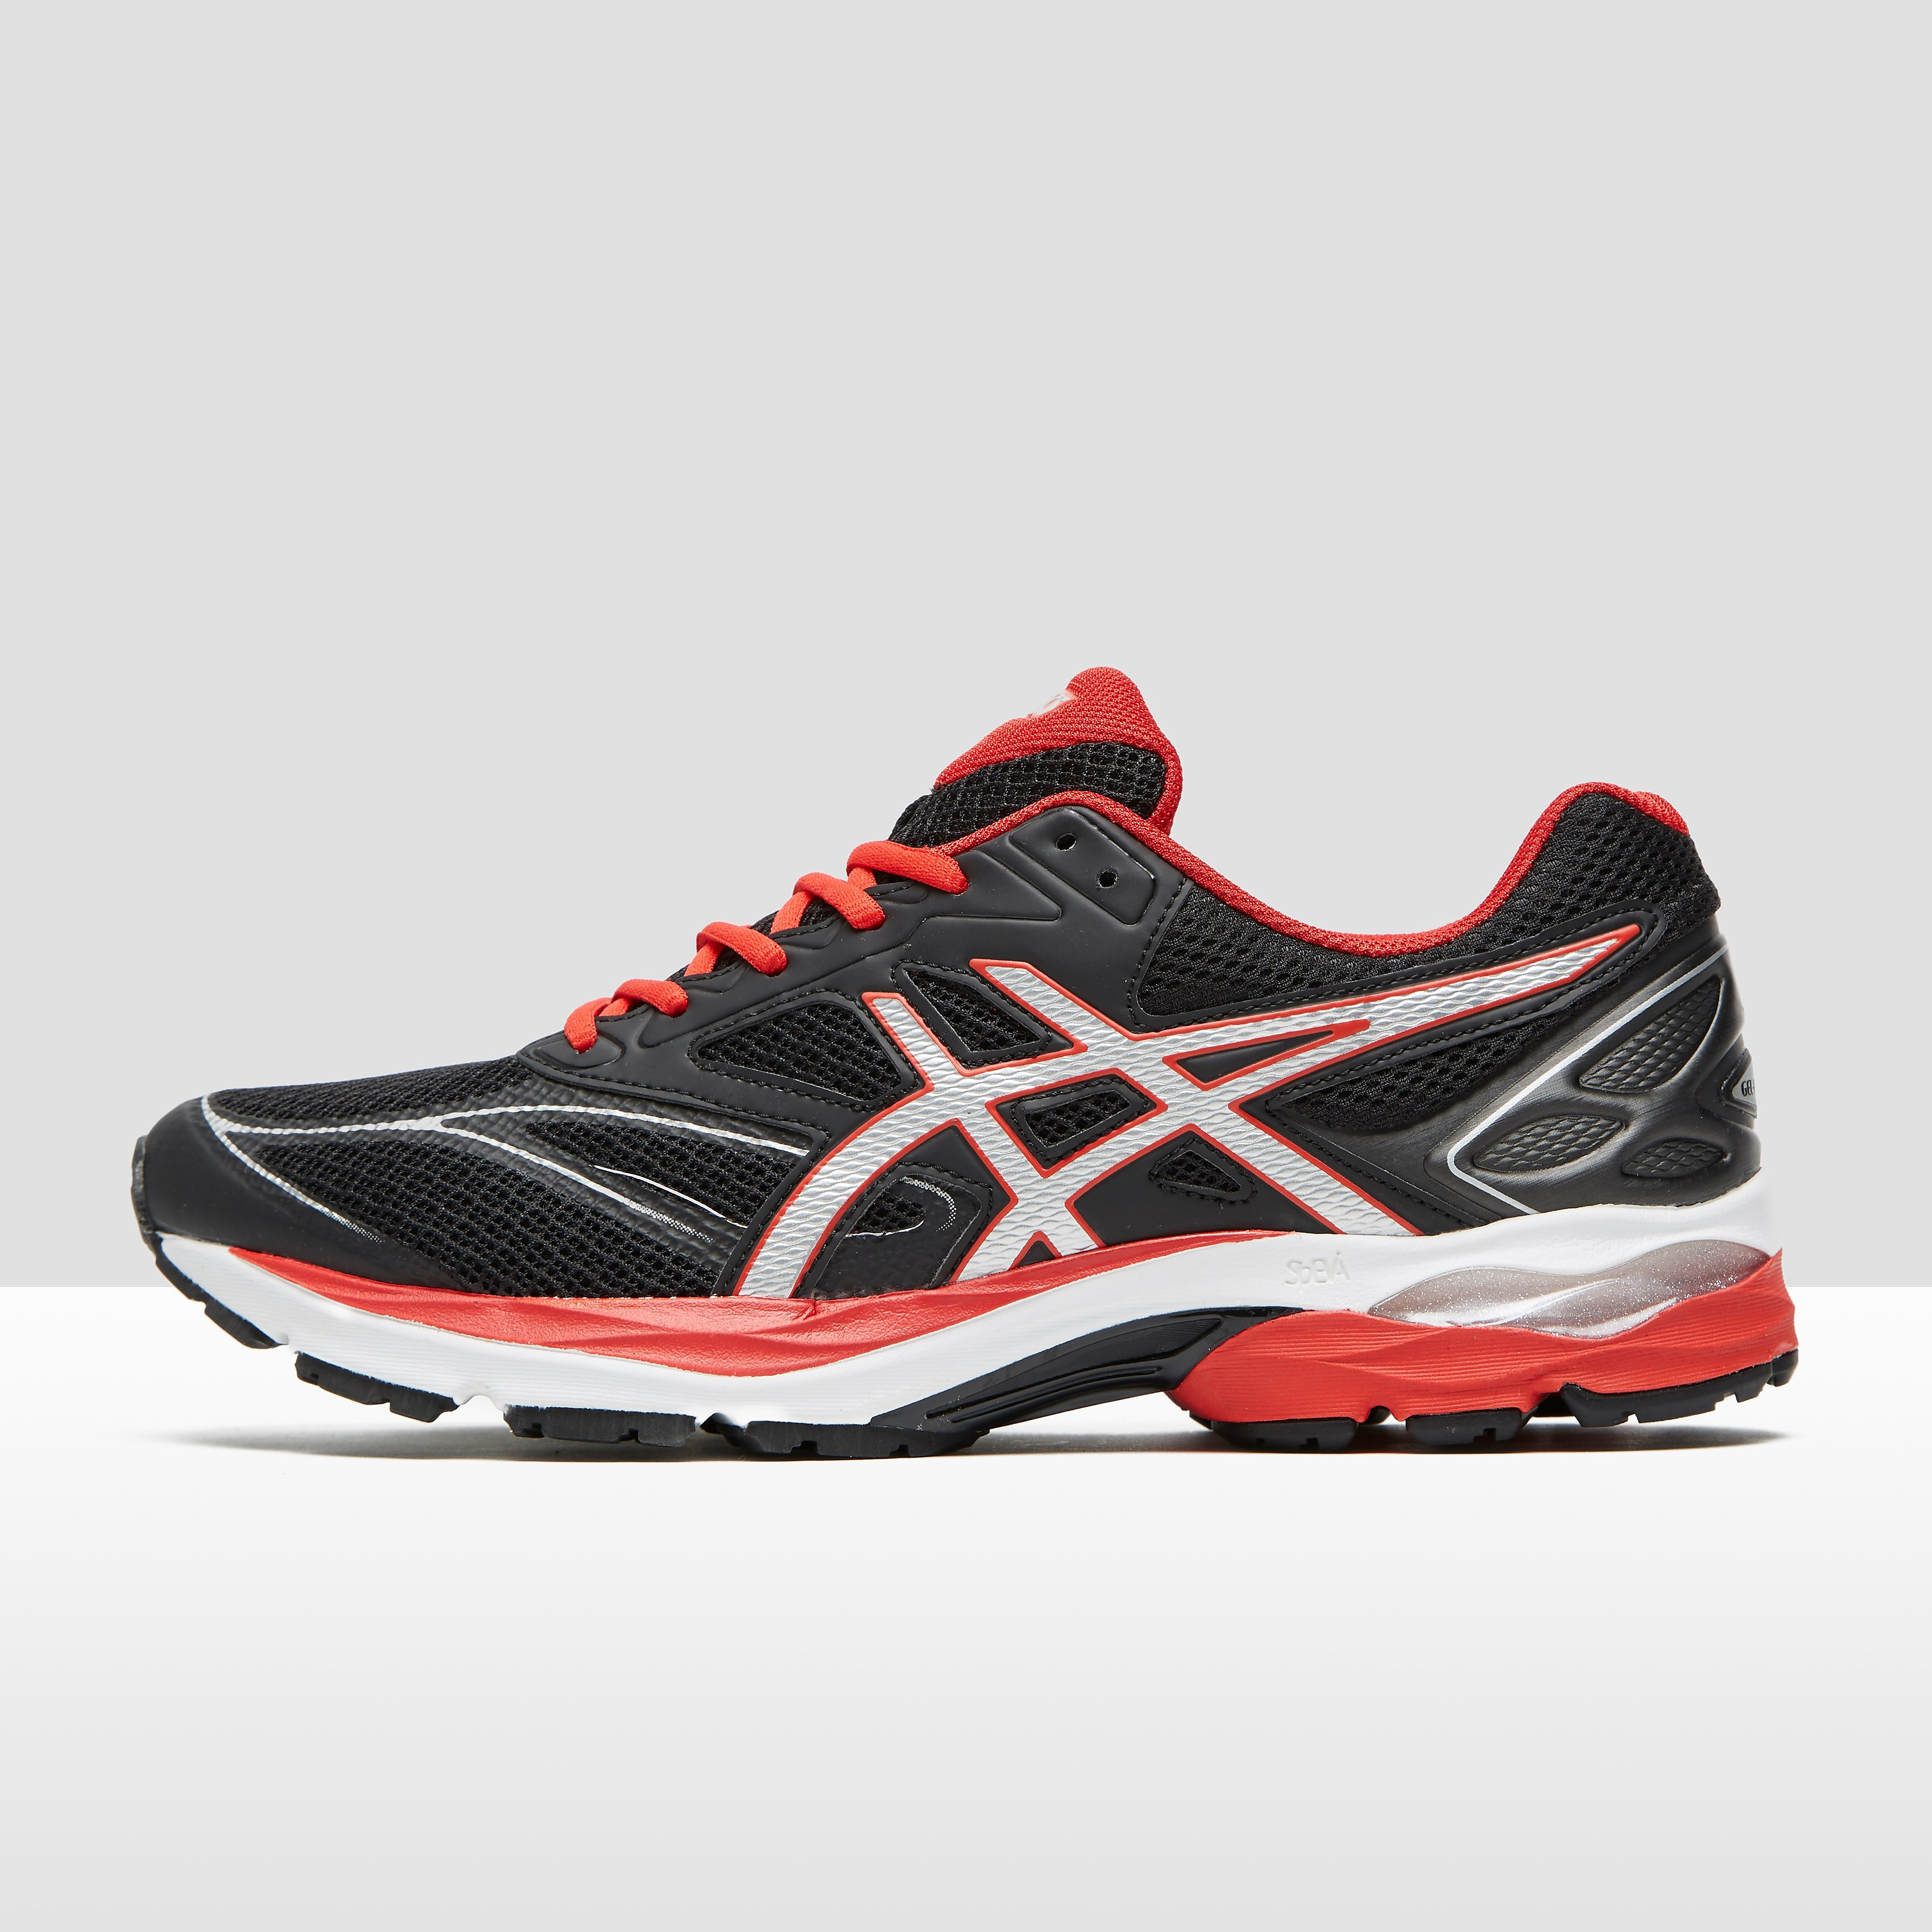 Asics Men's Gel-Pulse 8 Running shoes